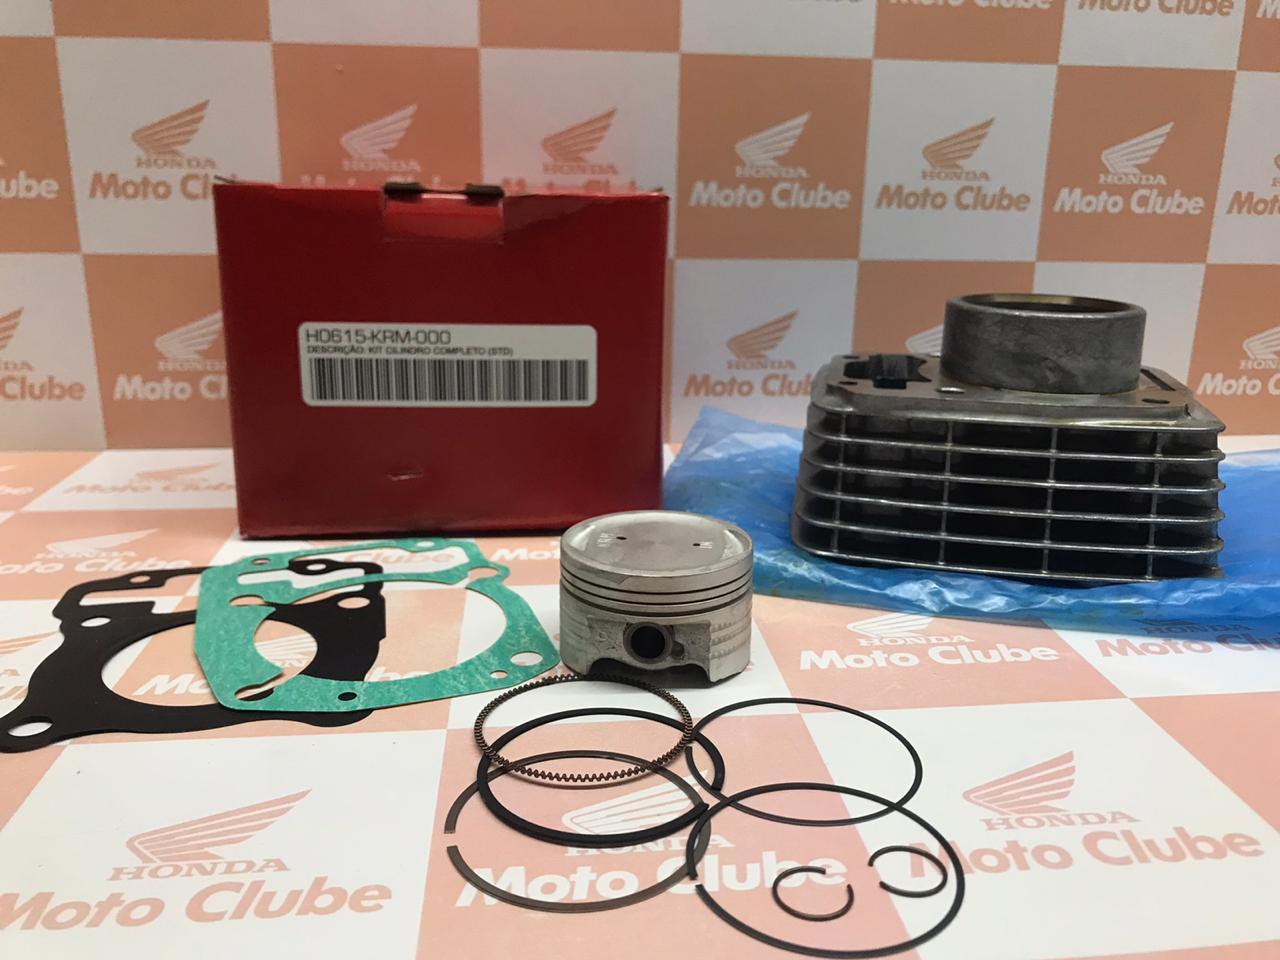 Kit Cilindro CG Titan e Fan 150 NXR Bros 150 Original Honda H0615KRM000